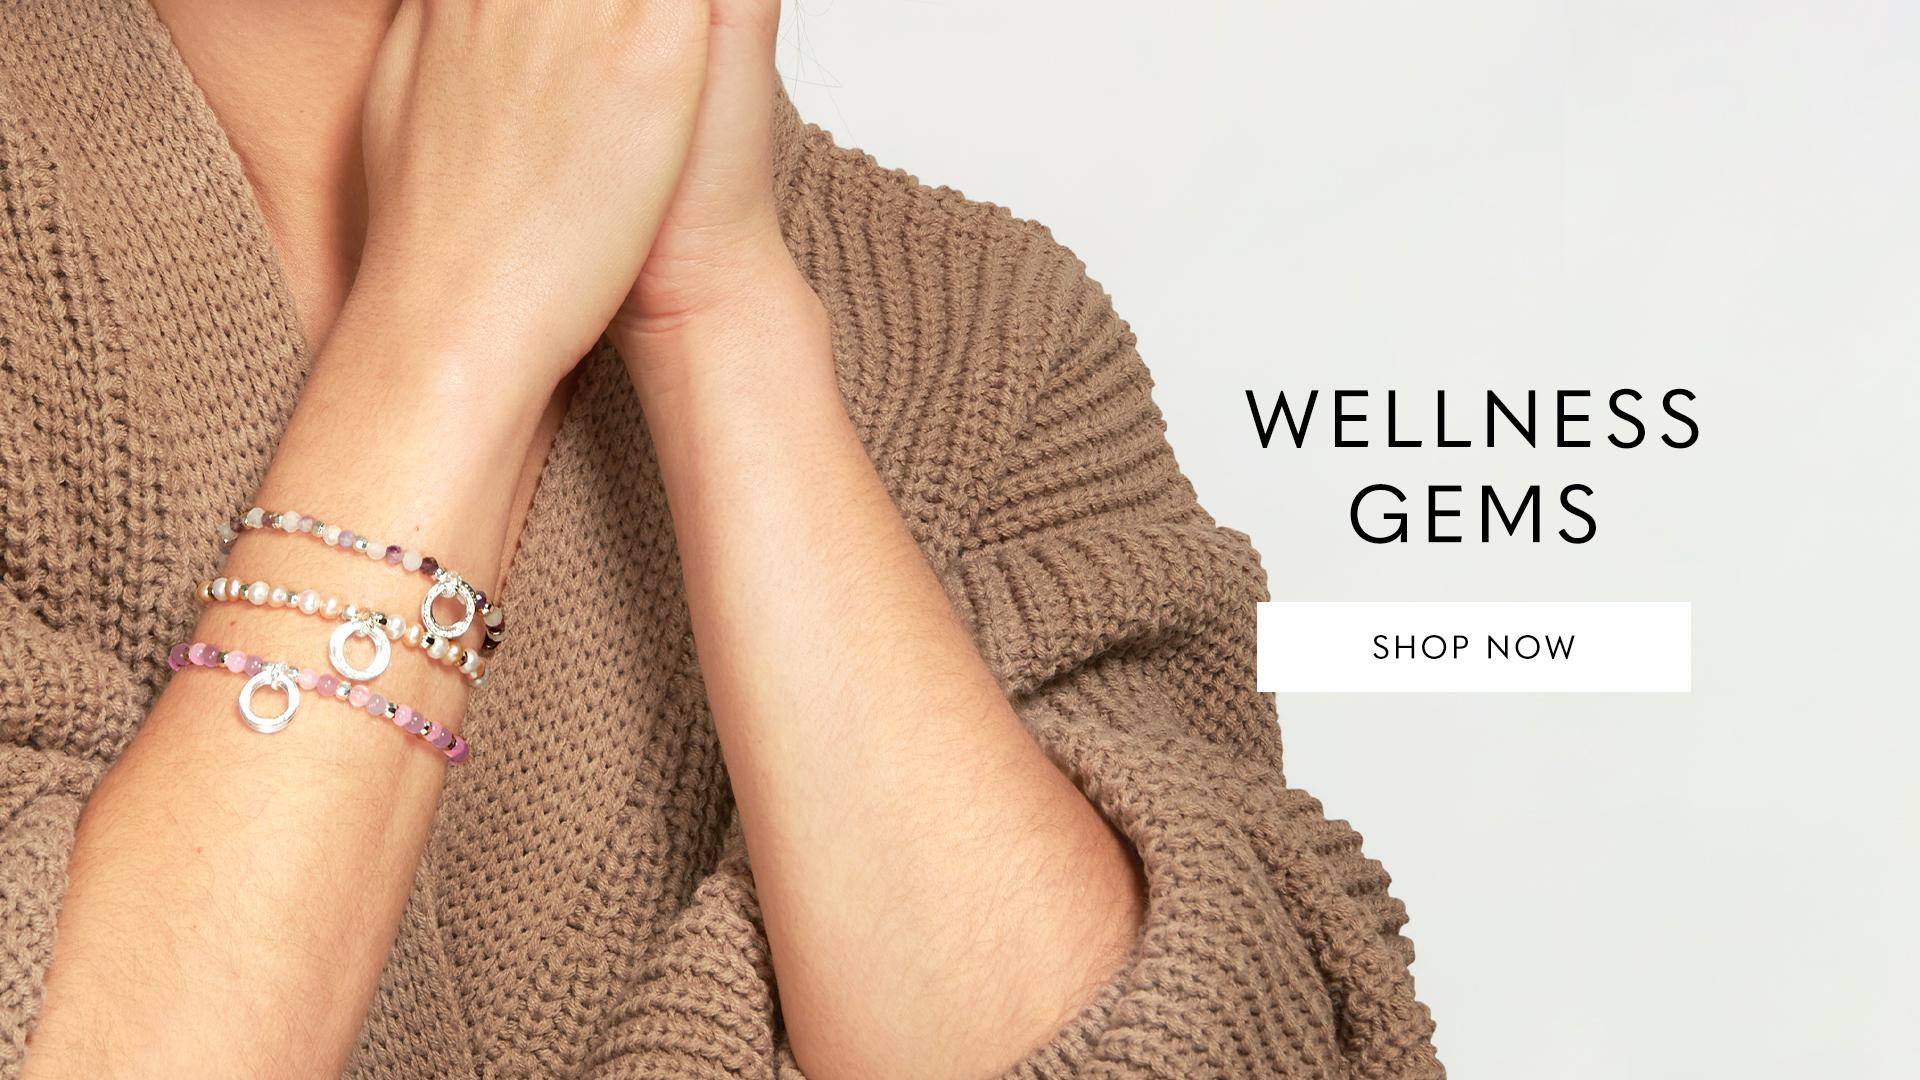 Wellness Gems Collection